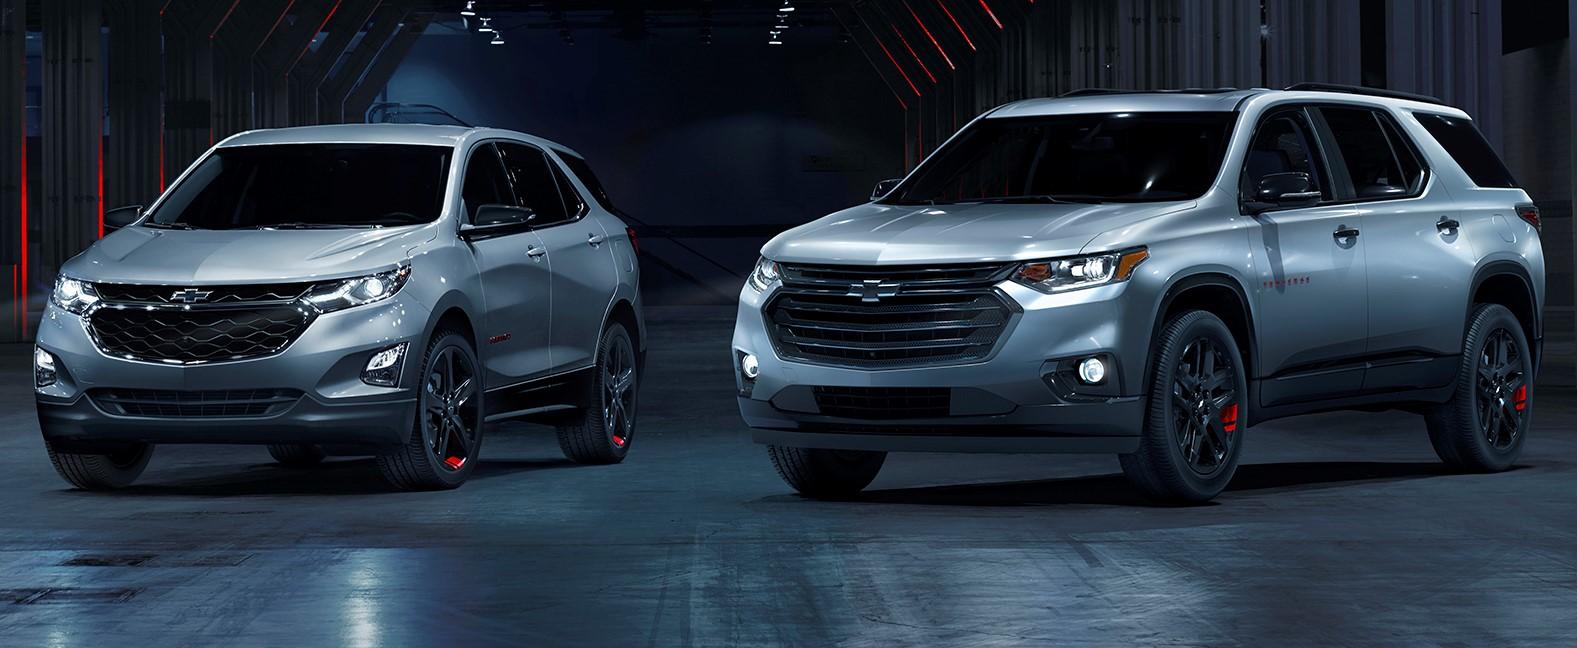 Chevrolet Dealerships Colorado REDLINE TAKES CHEVROLET DESIGN TO THE NEXT LEVEL ...